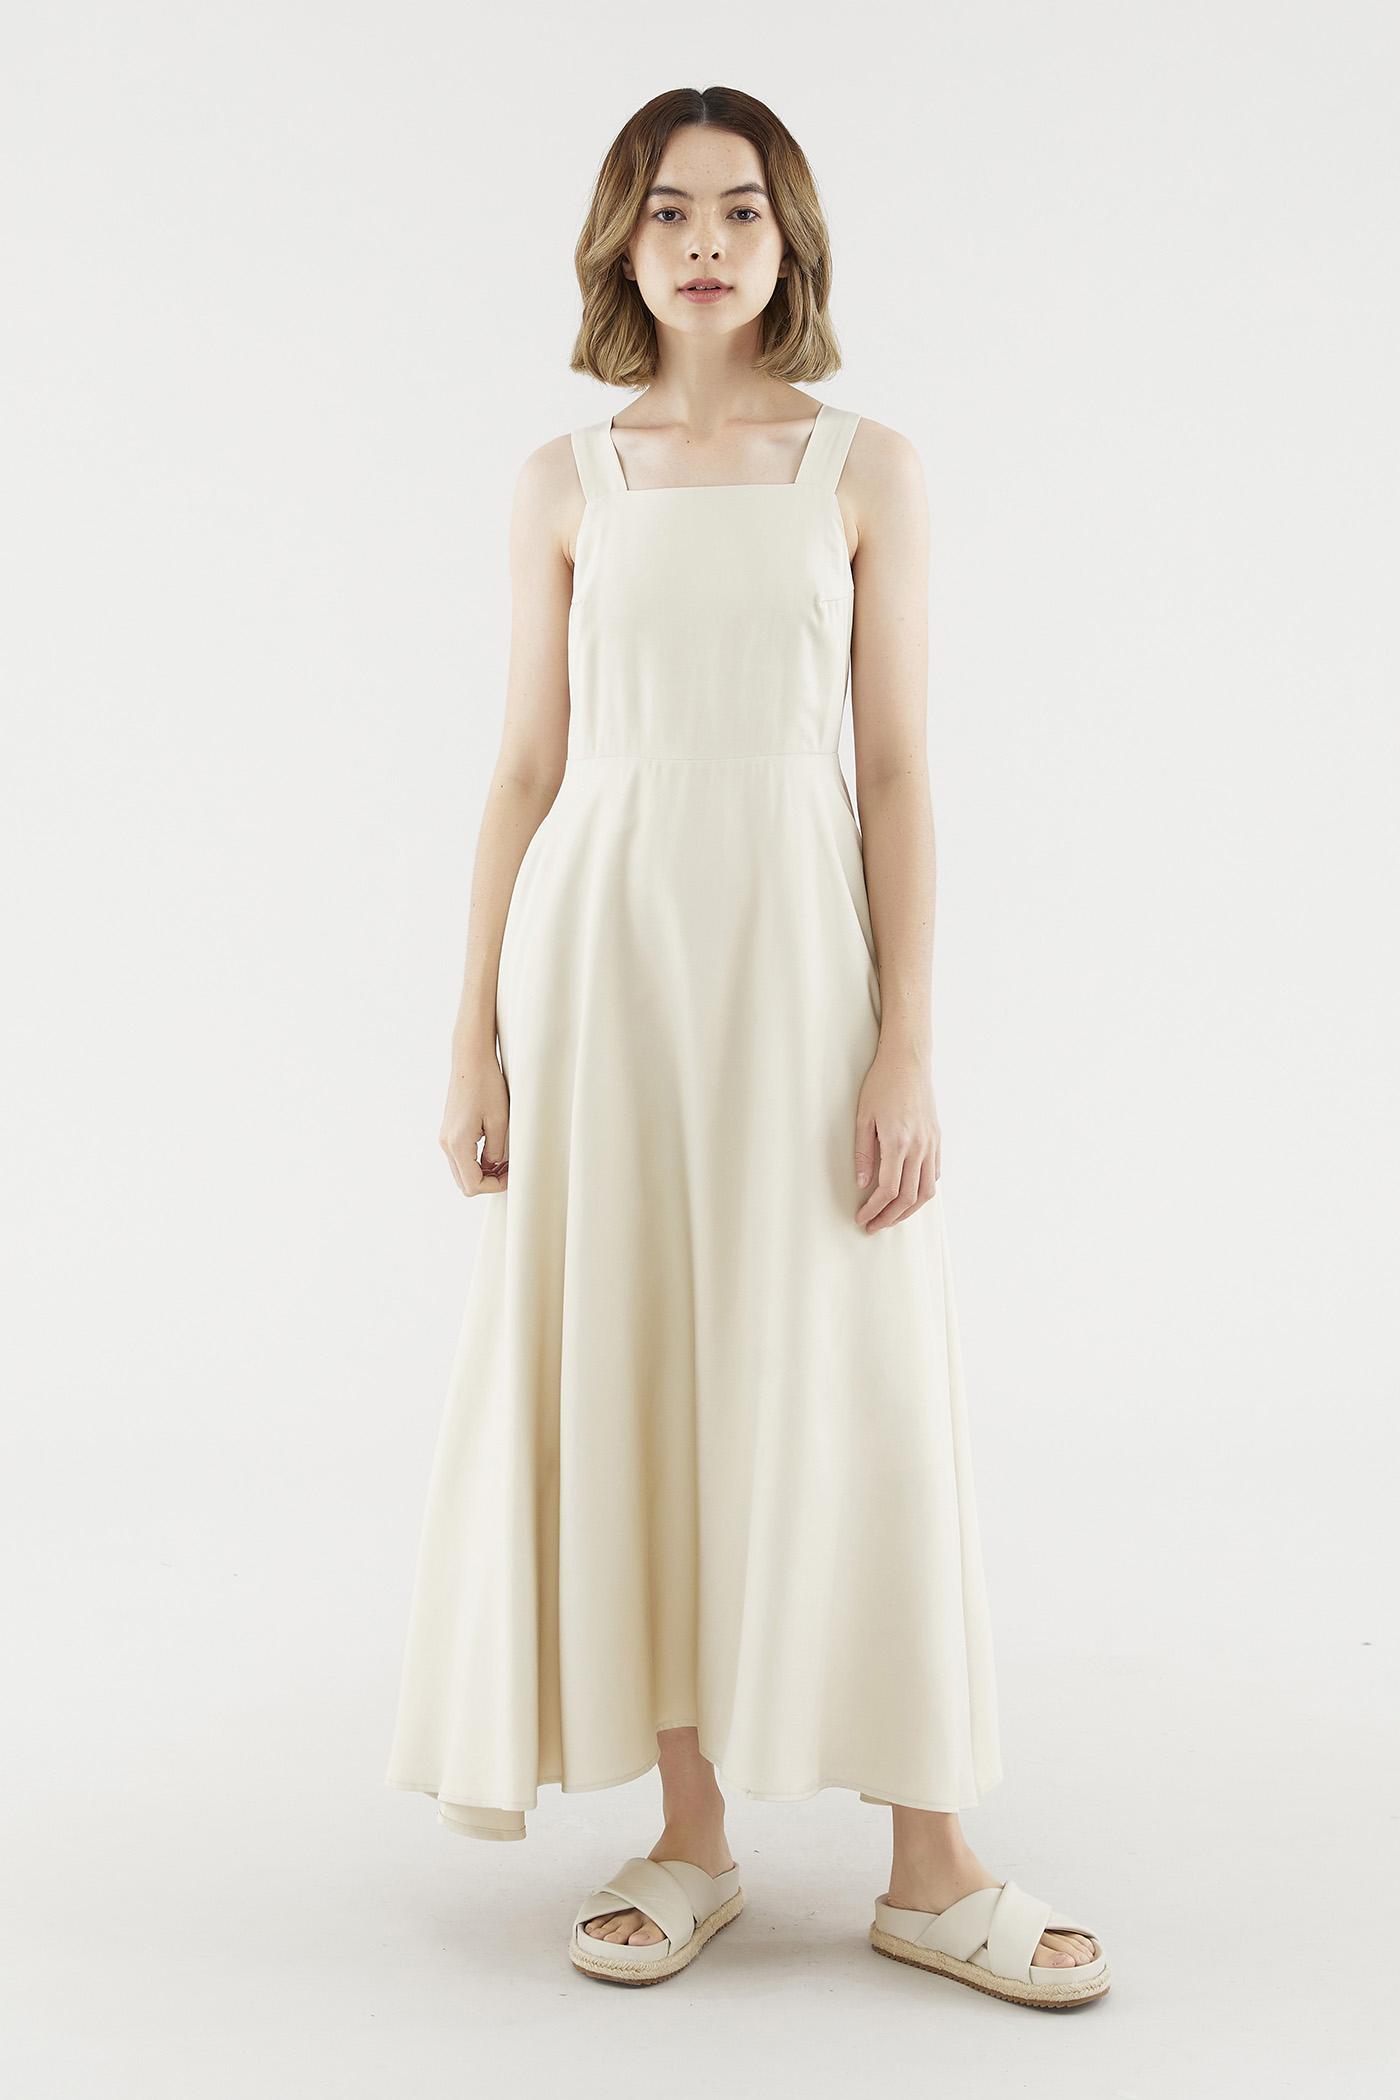 Lilyann Dress